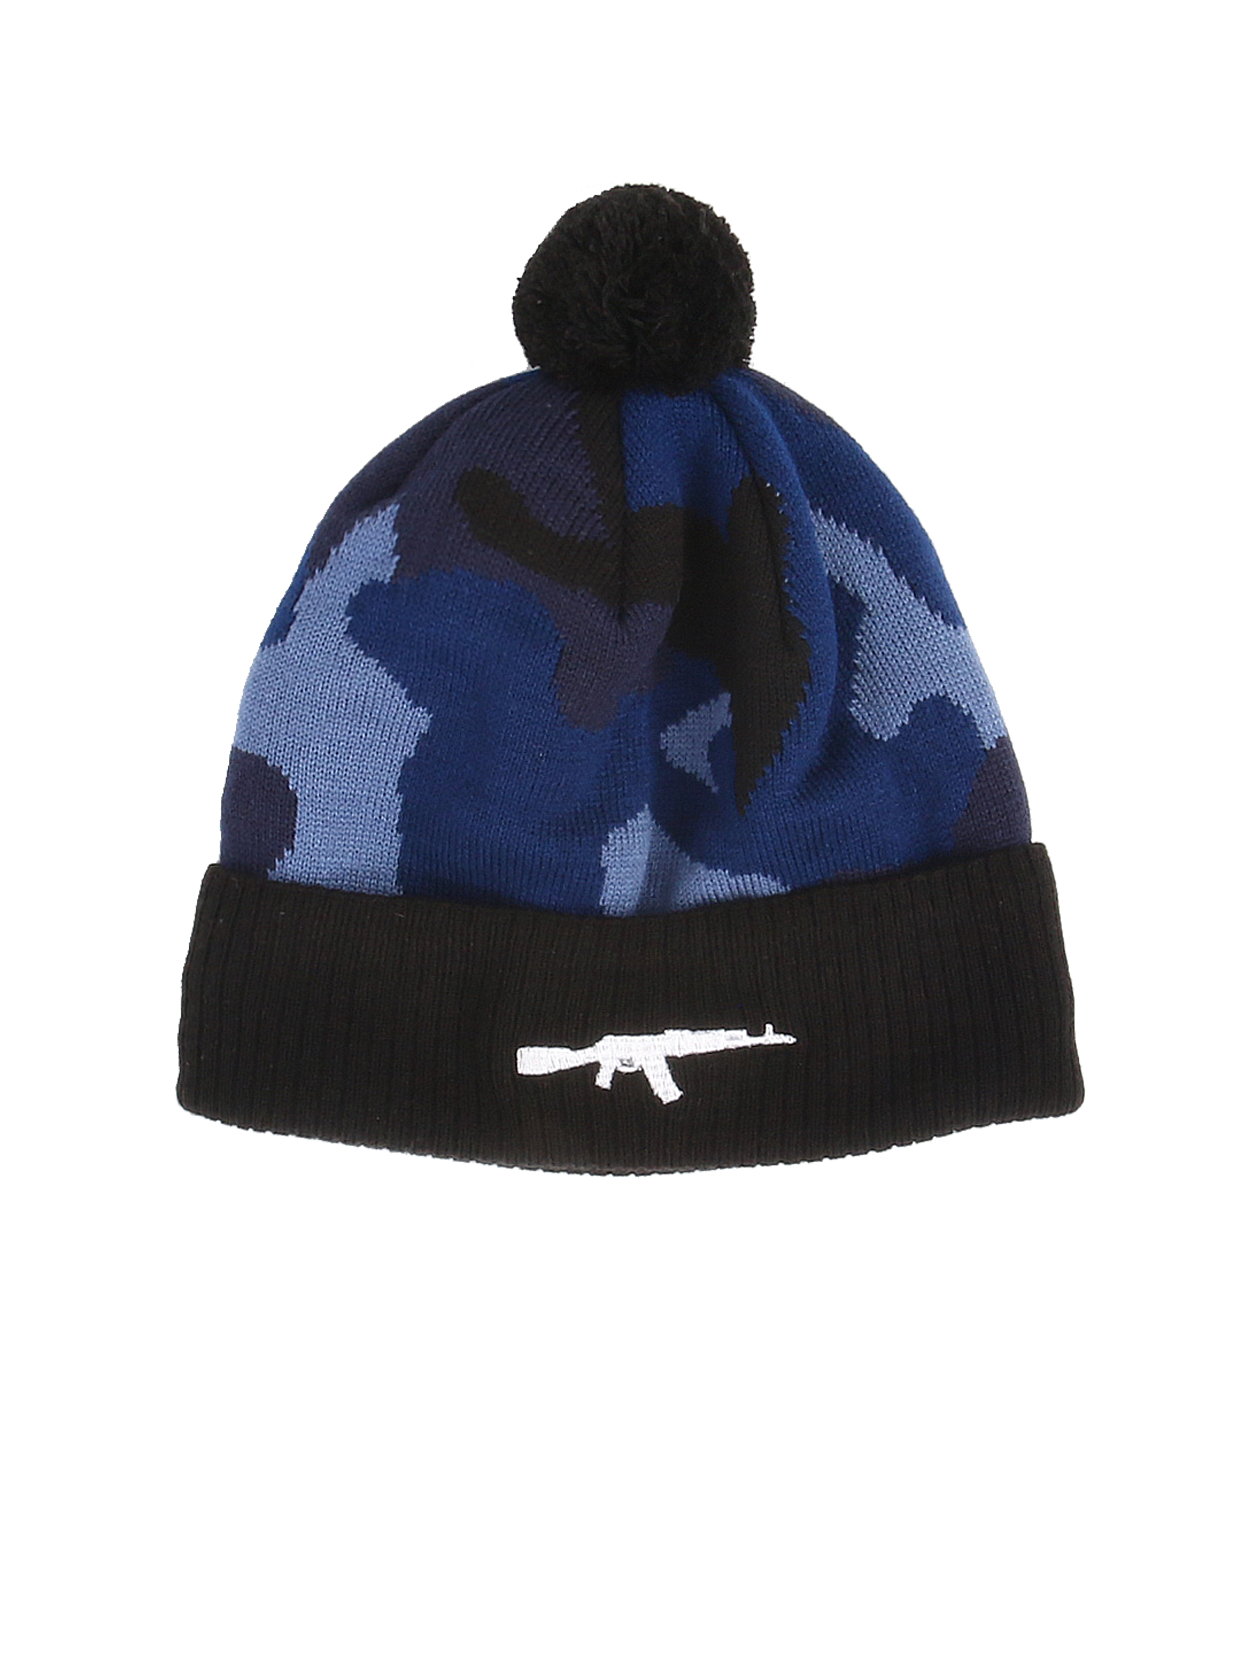 Unisex hat Blue Camo Rifle